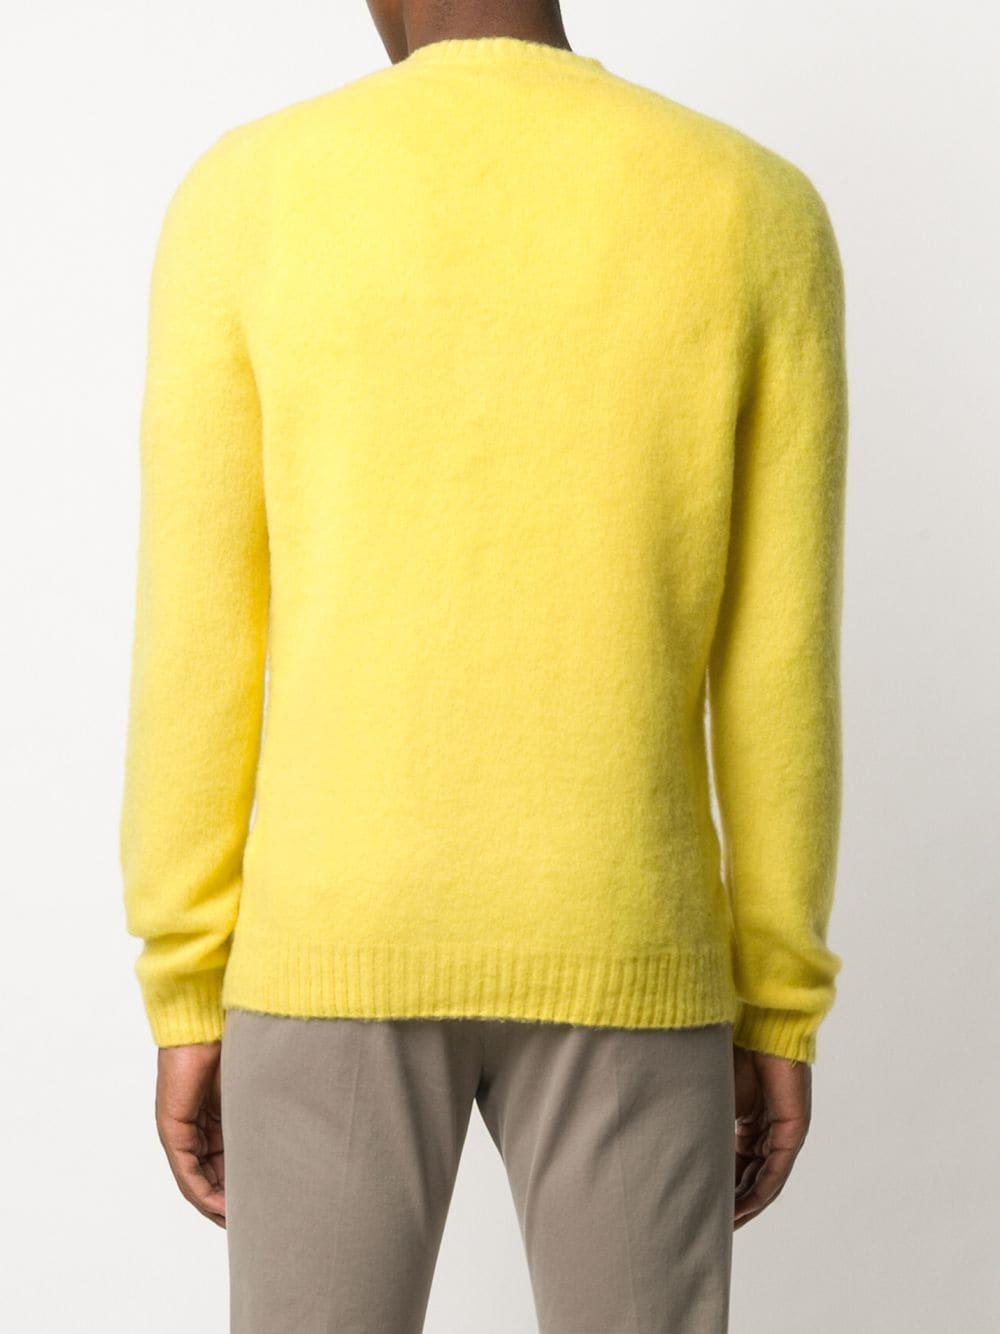 Lemon yellow wool textured crew-neck sweater  ELEVENTY |  | B76MAGB47-MAG0B06228